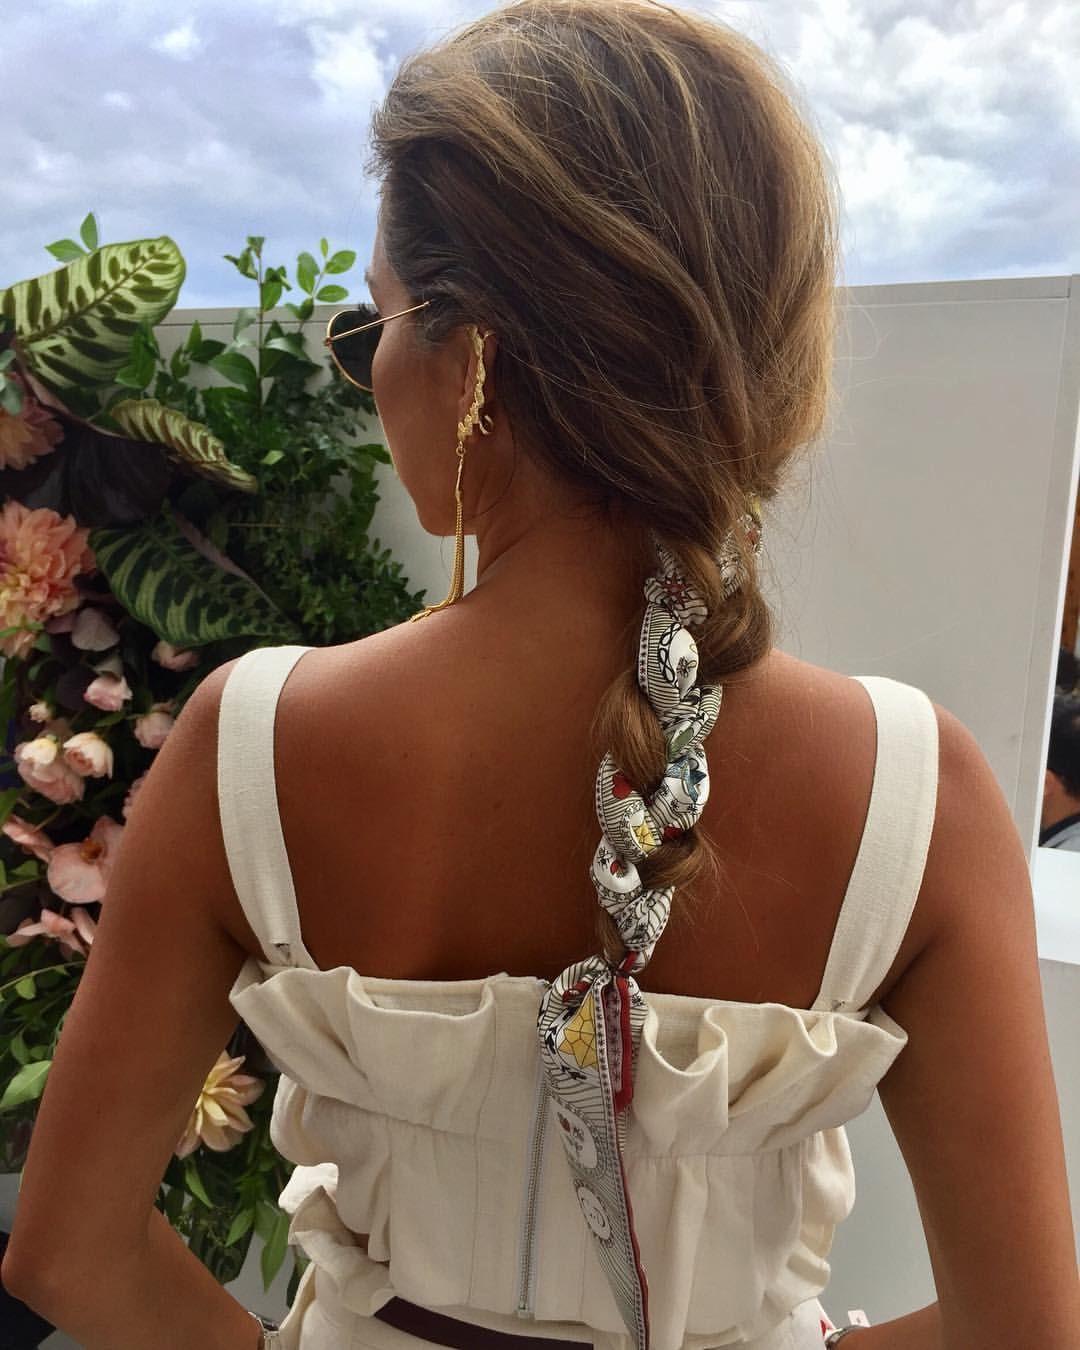 Hair Braid With Scarf Rozalia Russian Scarf Dior Top Steele